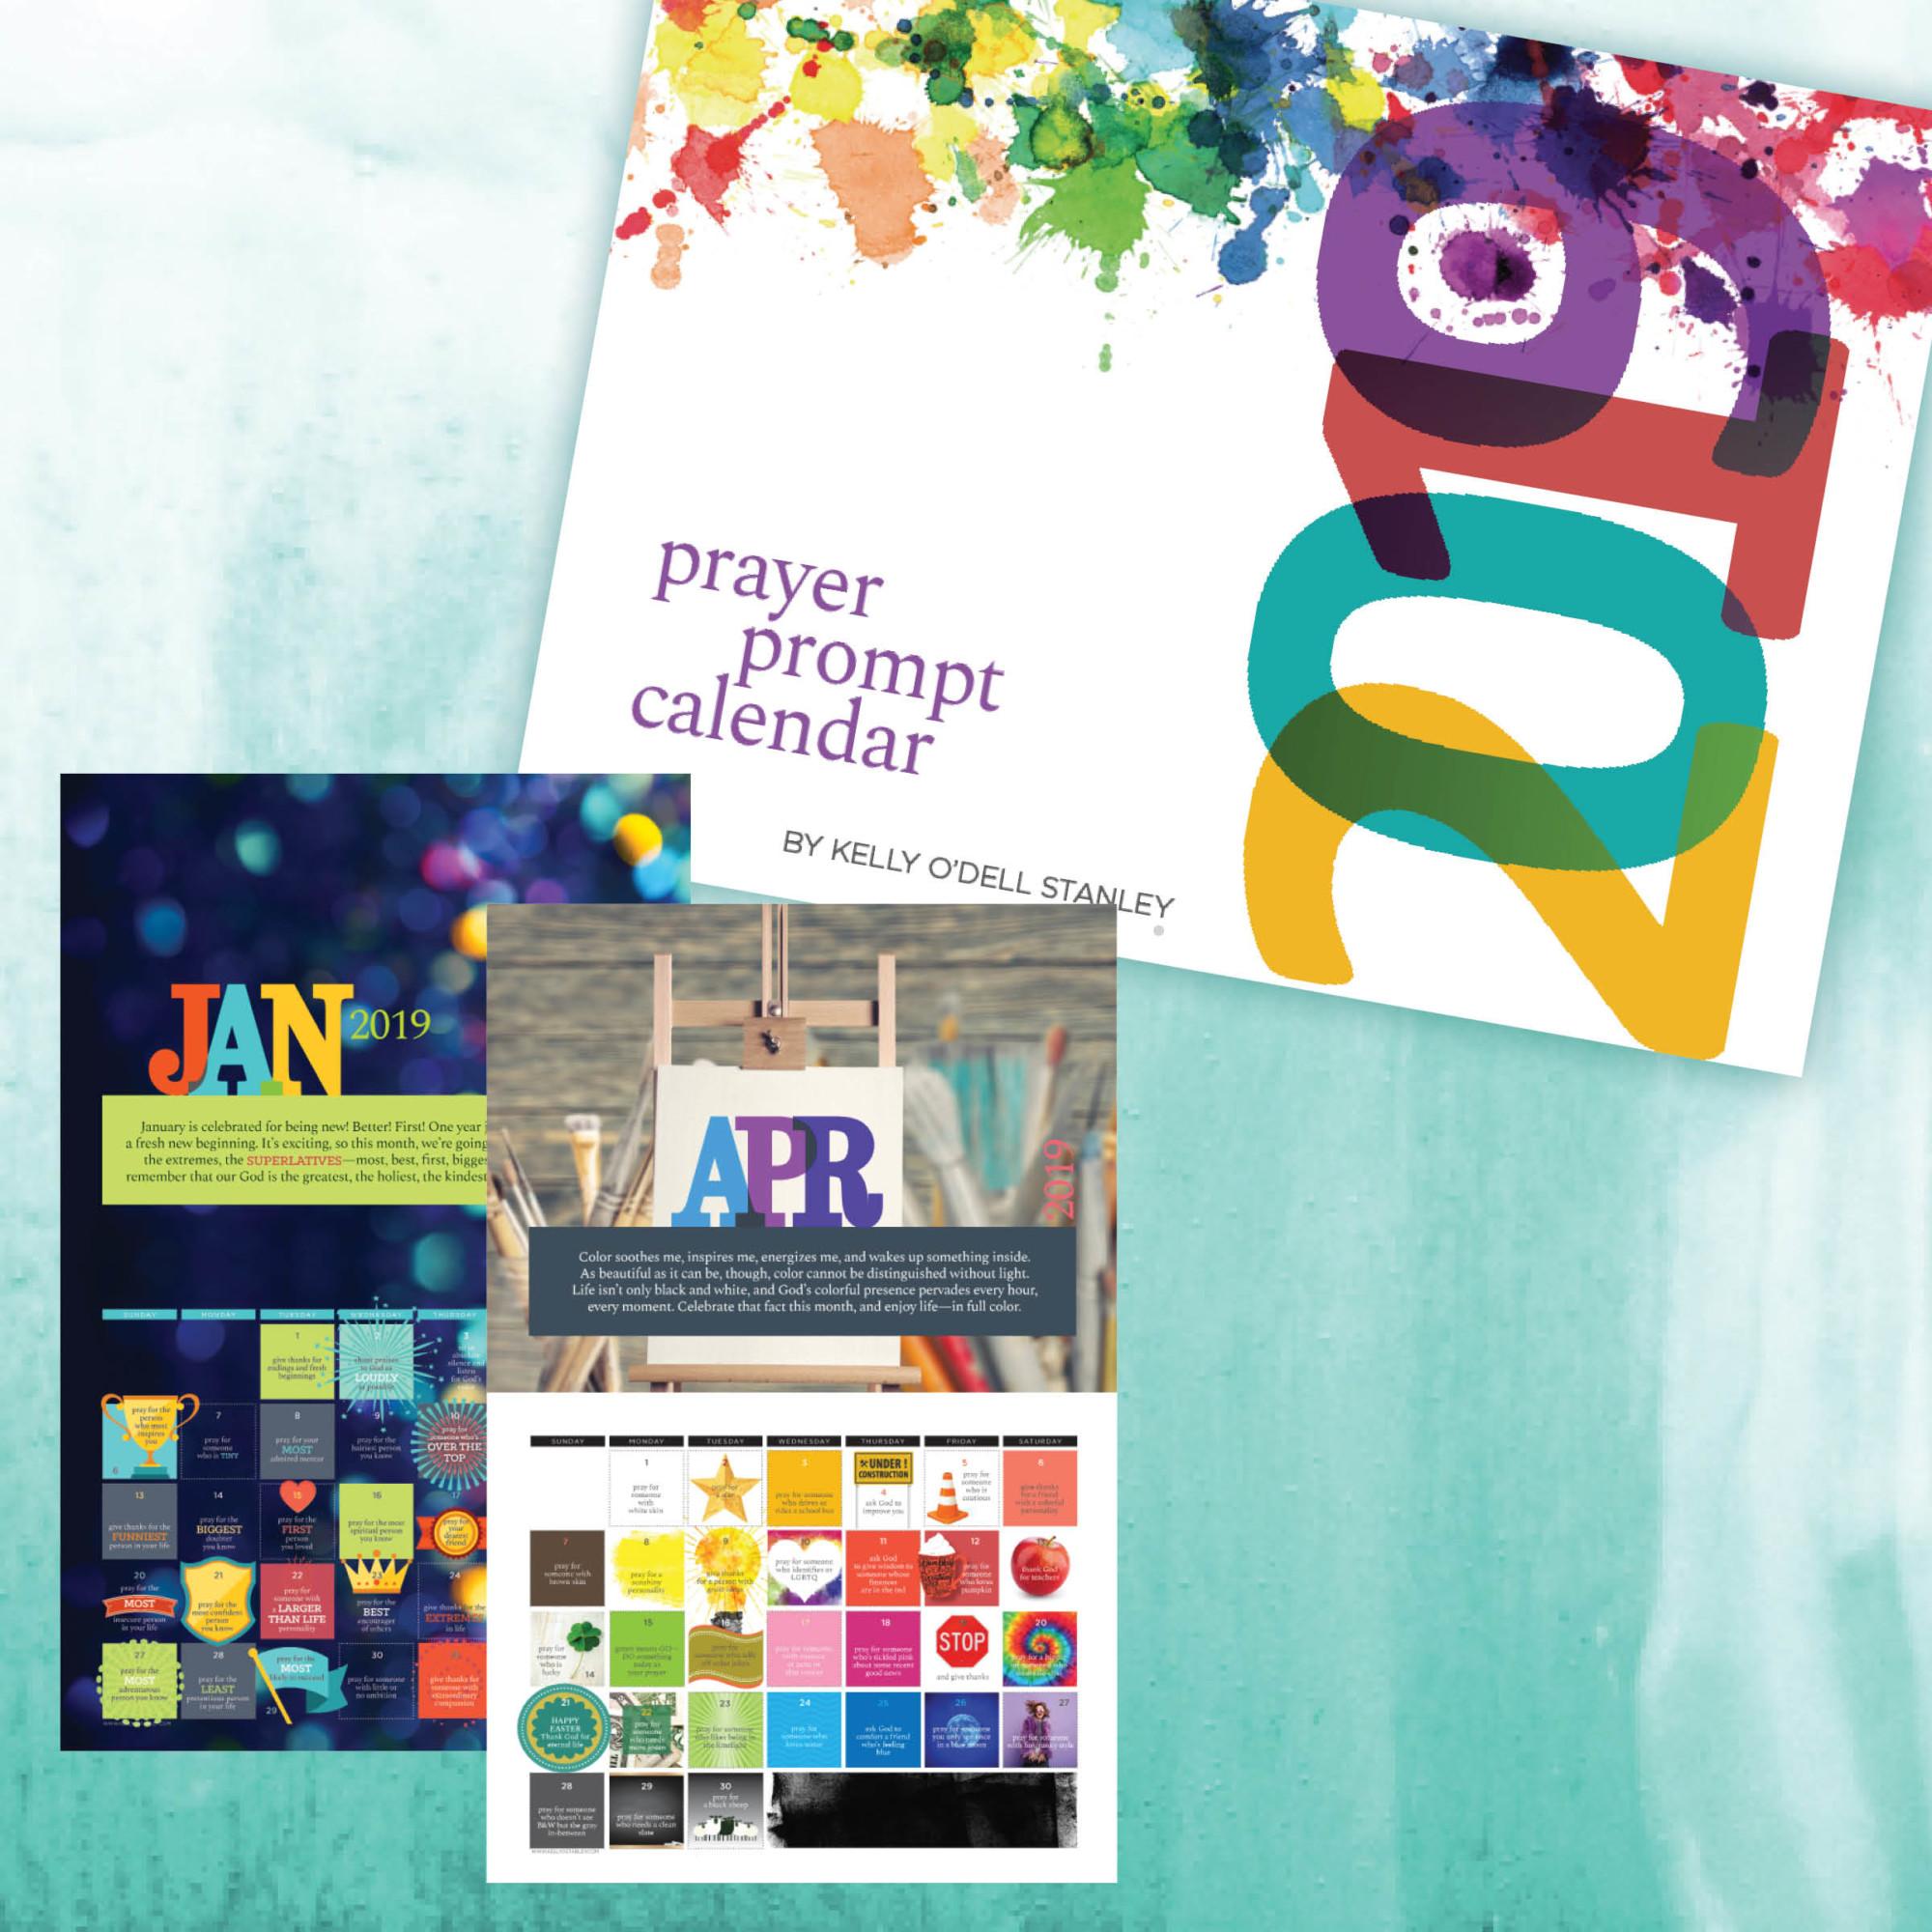 image regarding Printable Monthly Prayer Calendar titled 2019 Wall Calendar CLEARANCE - Kelly ODell Stanley